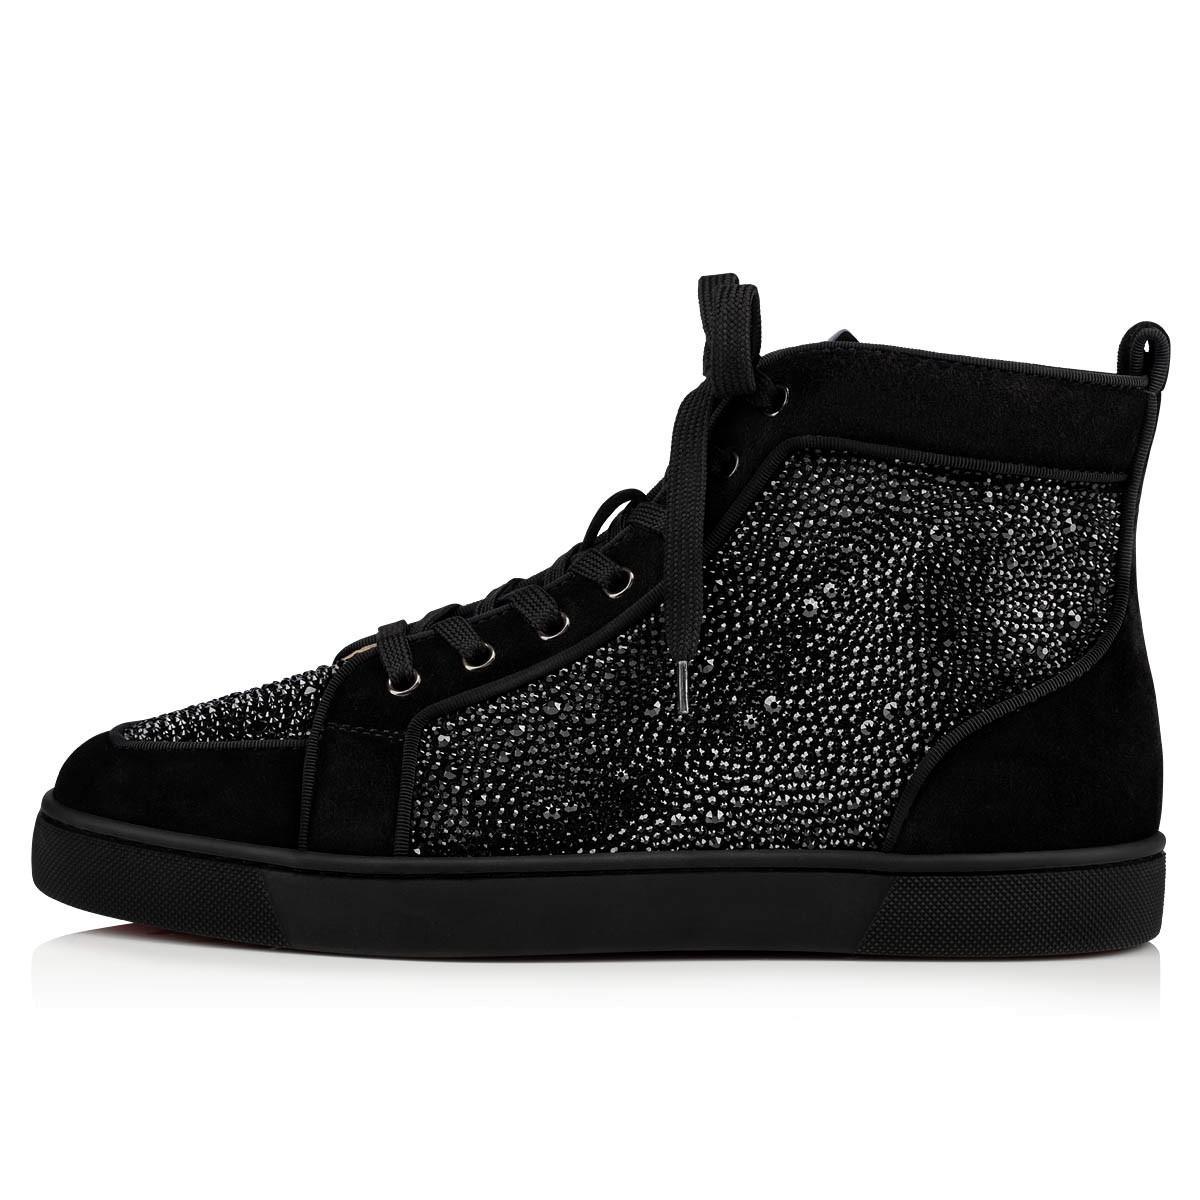 Men Shoes - Rantus Strass - Christian Louboutin